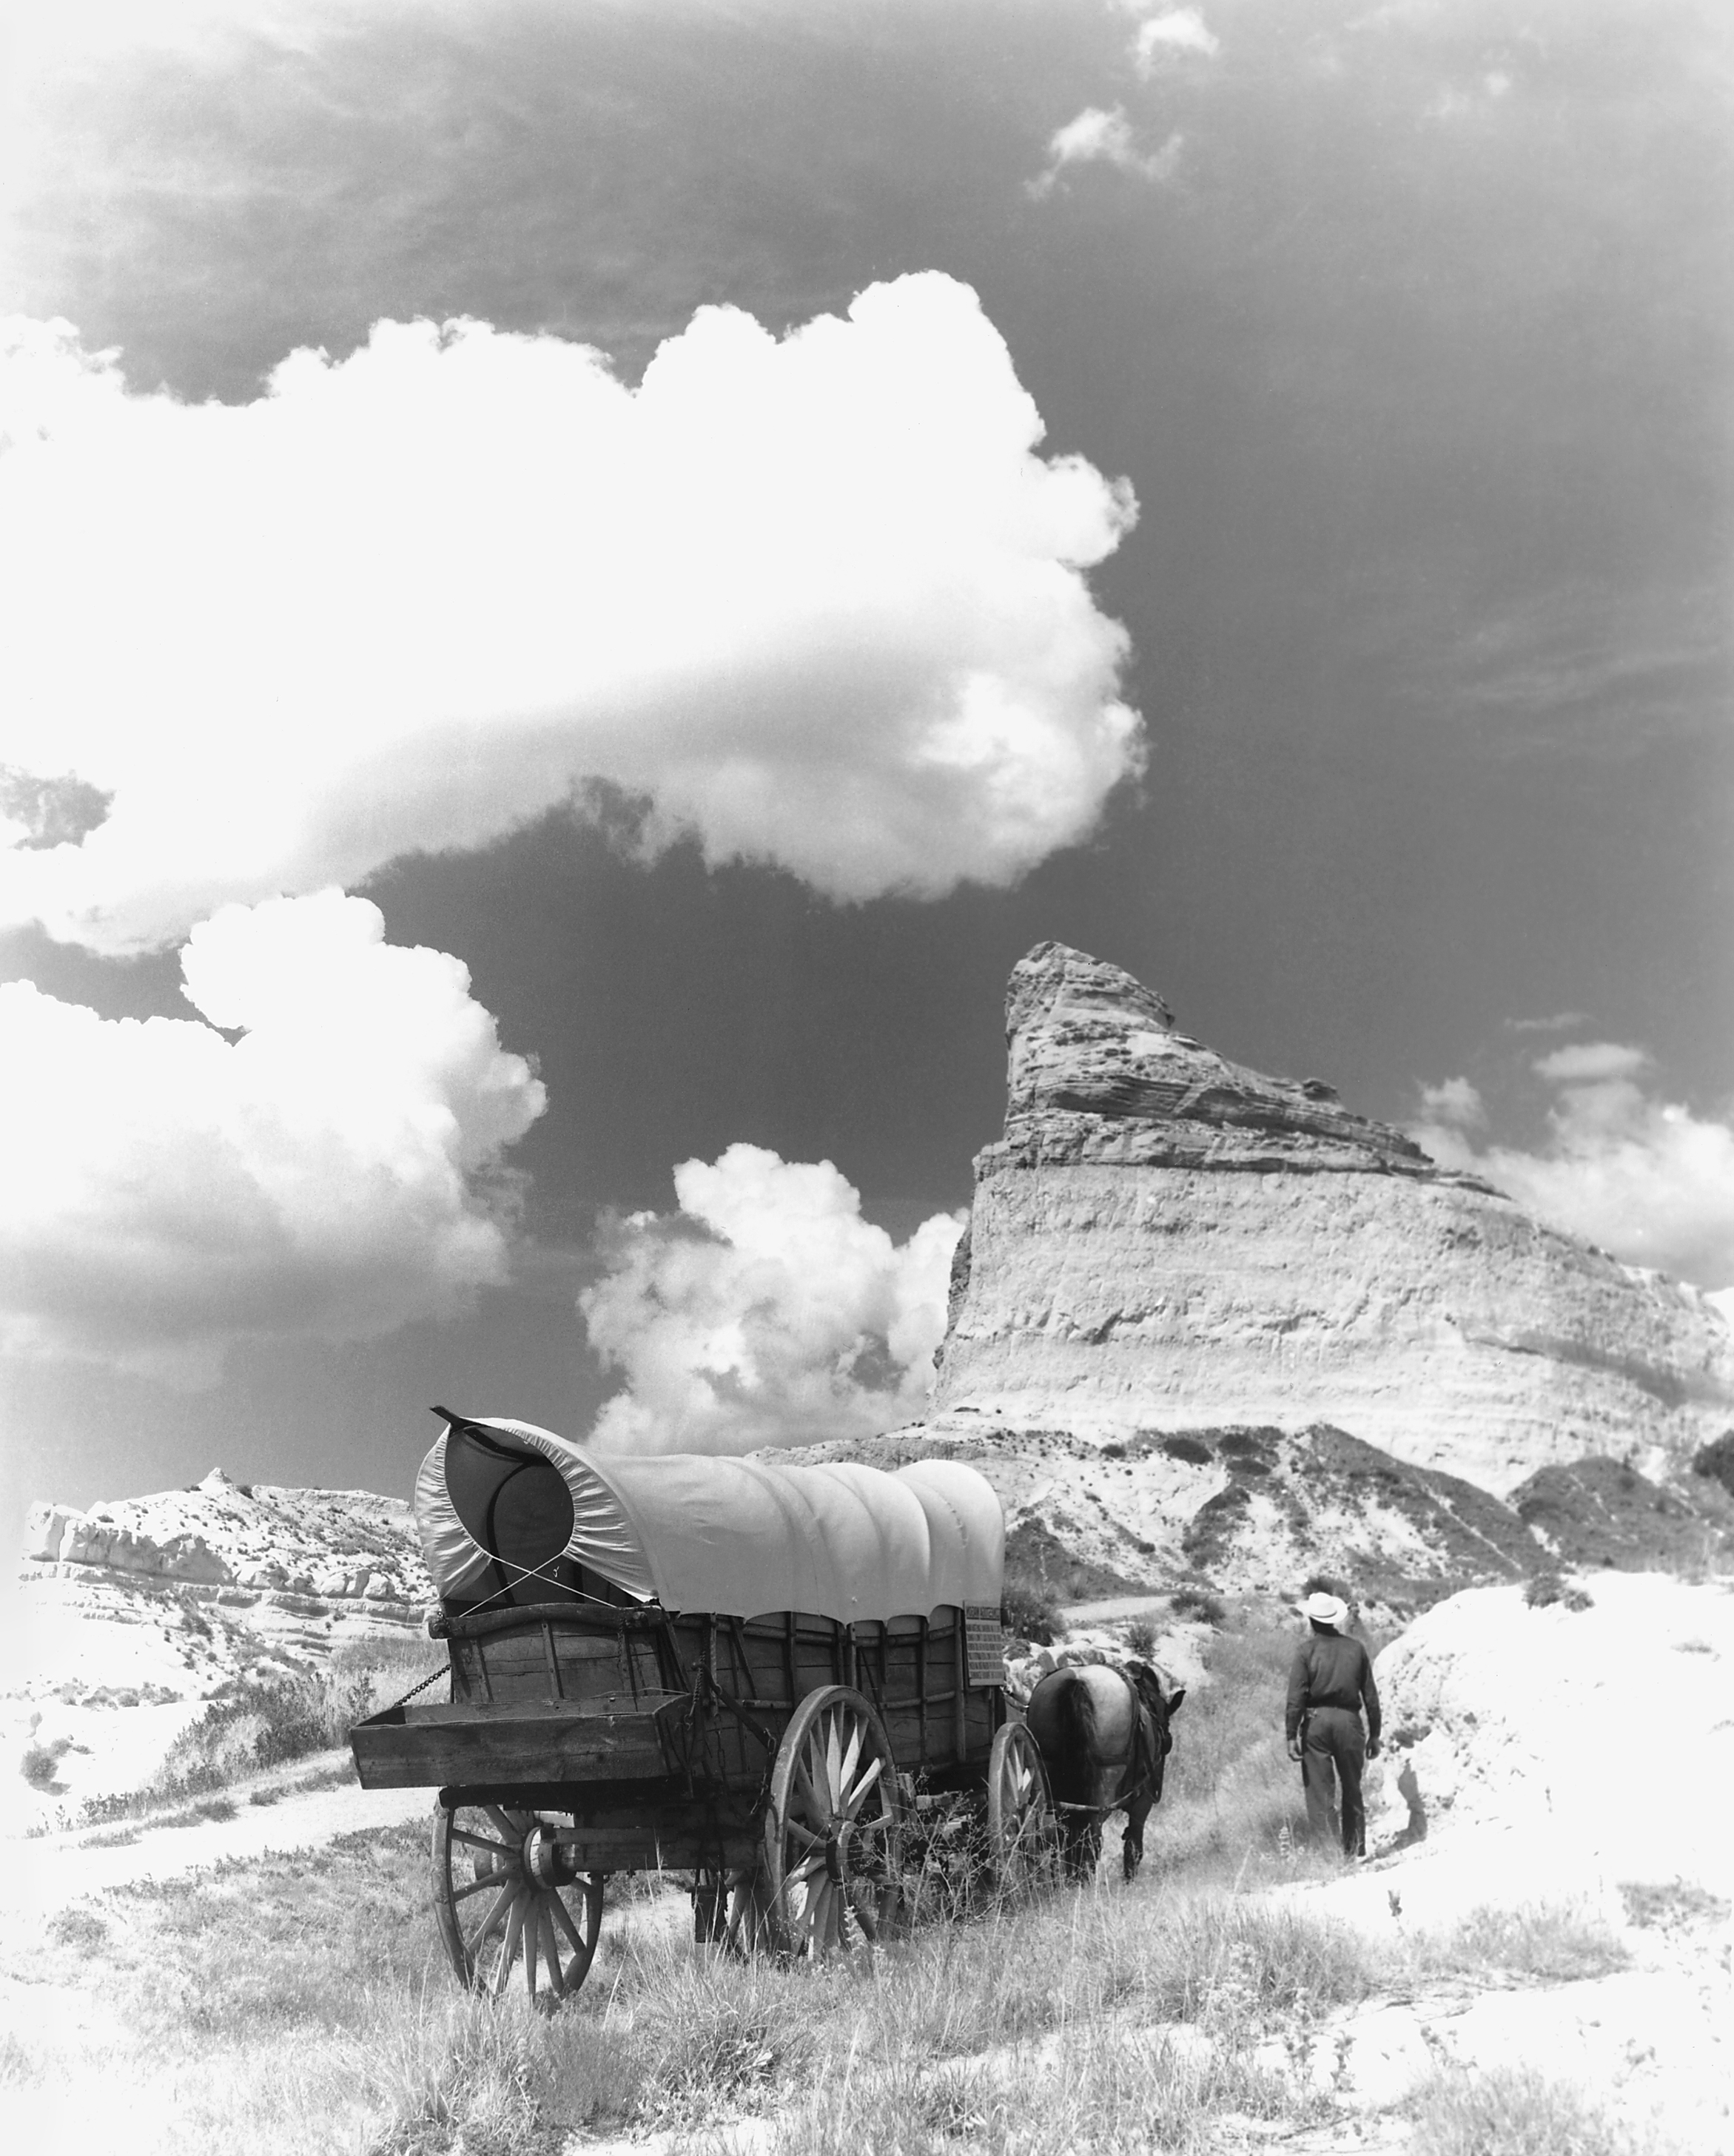 conestoga wagon on oregon trail - nara - 286056 - restoration.jpg